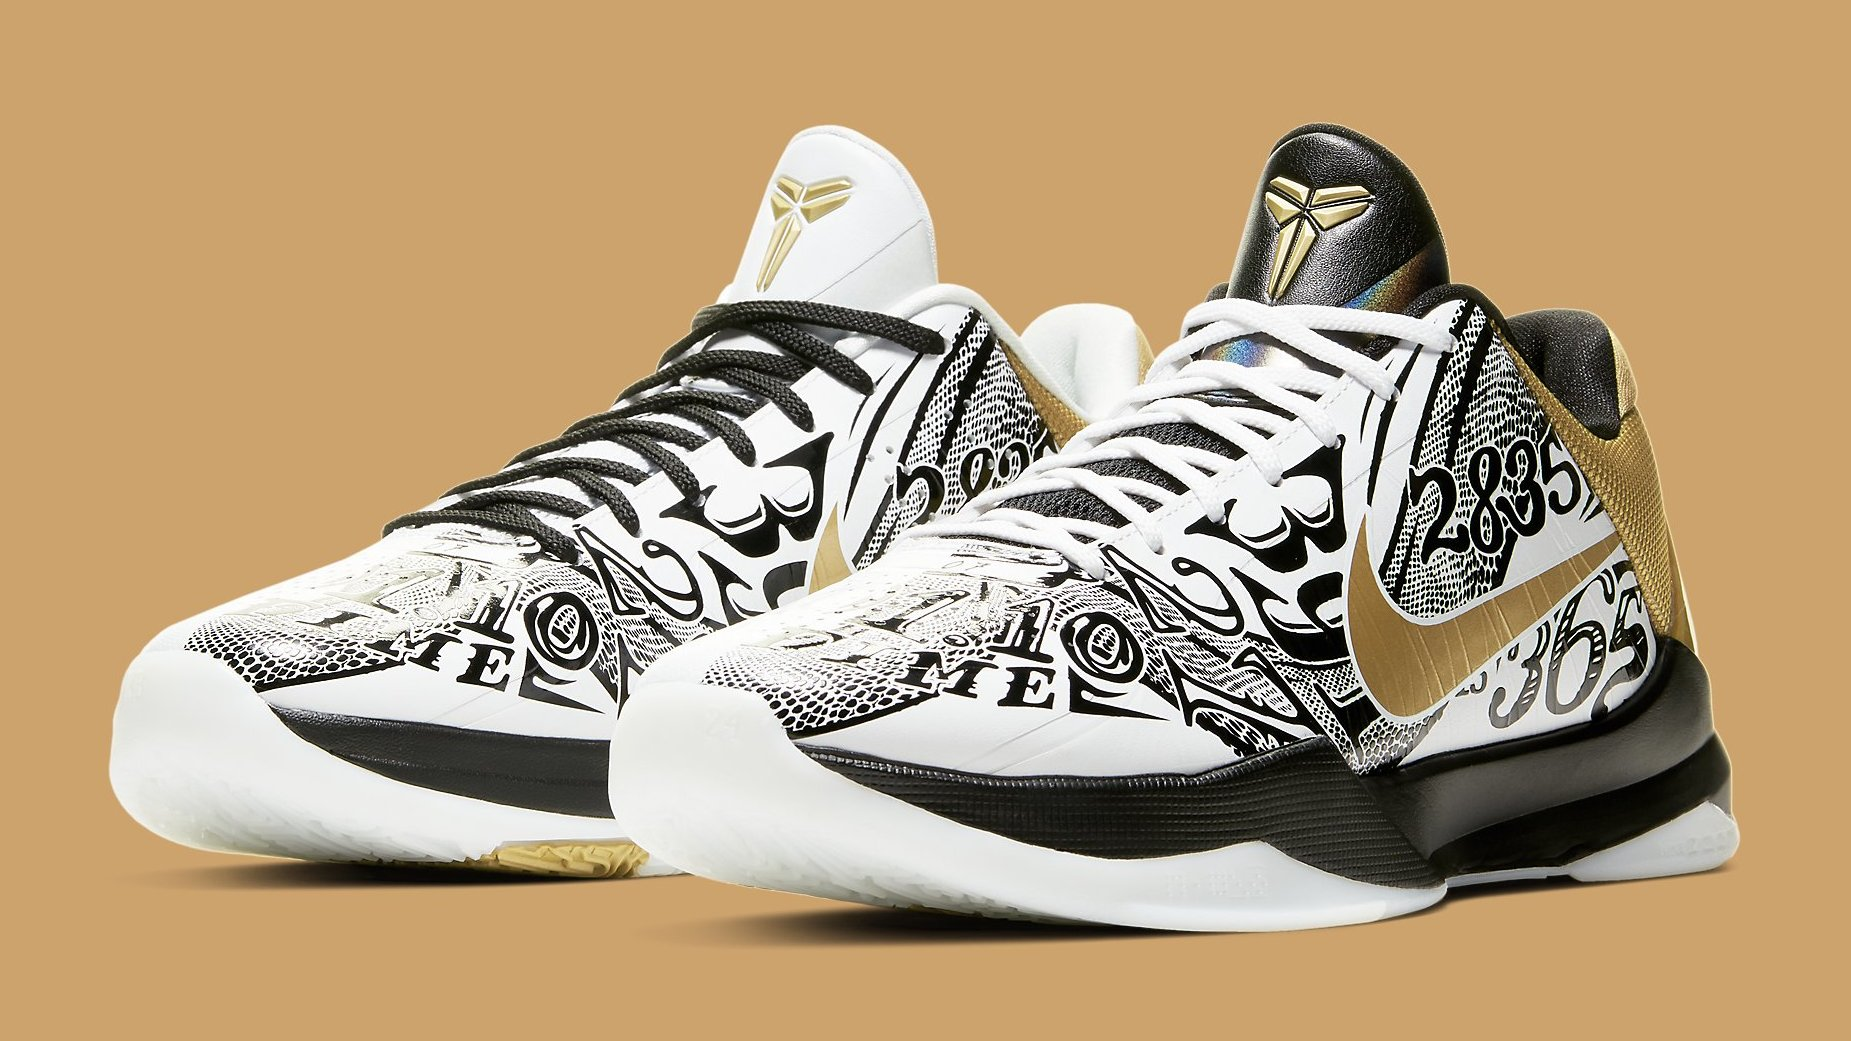 Nike Zoom Kobe 5 Protro 'Big Stage/Parade' Release Date CT8014-100 ...